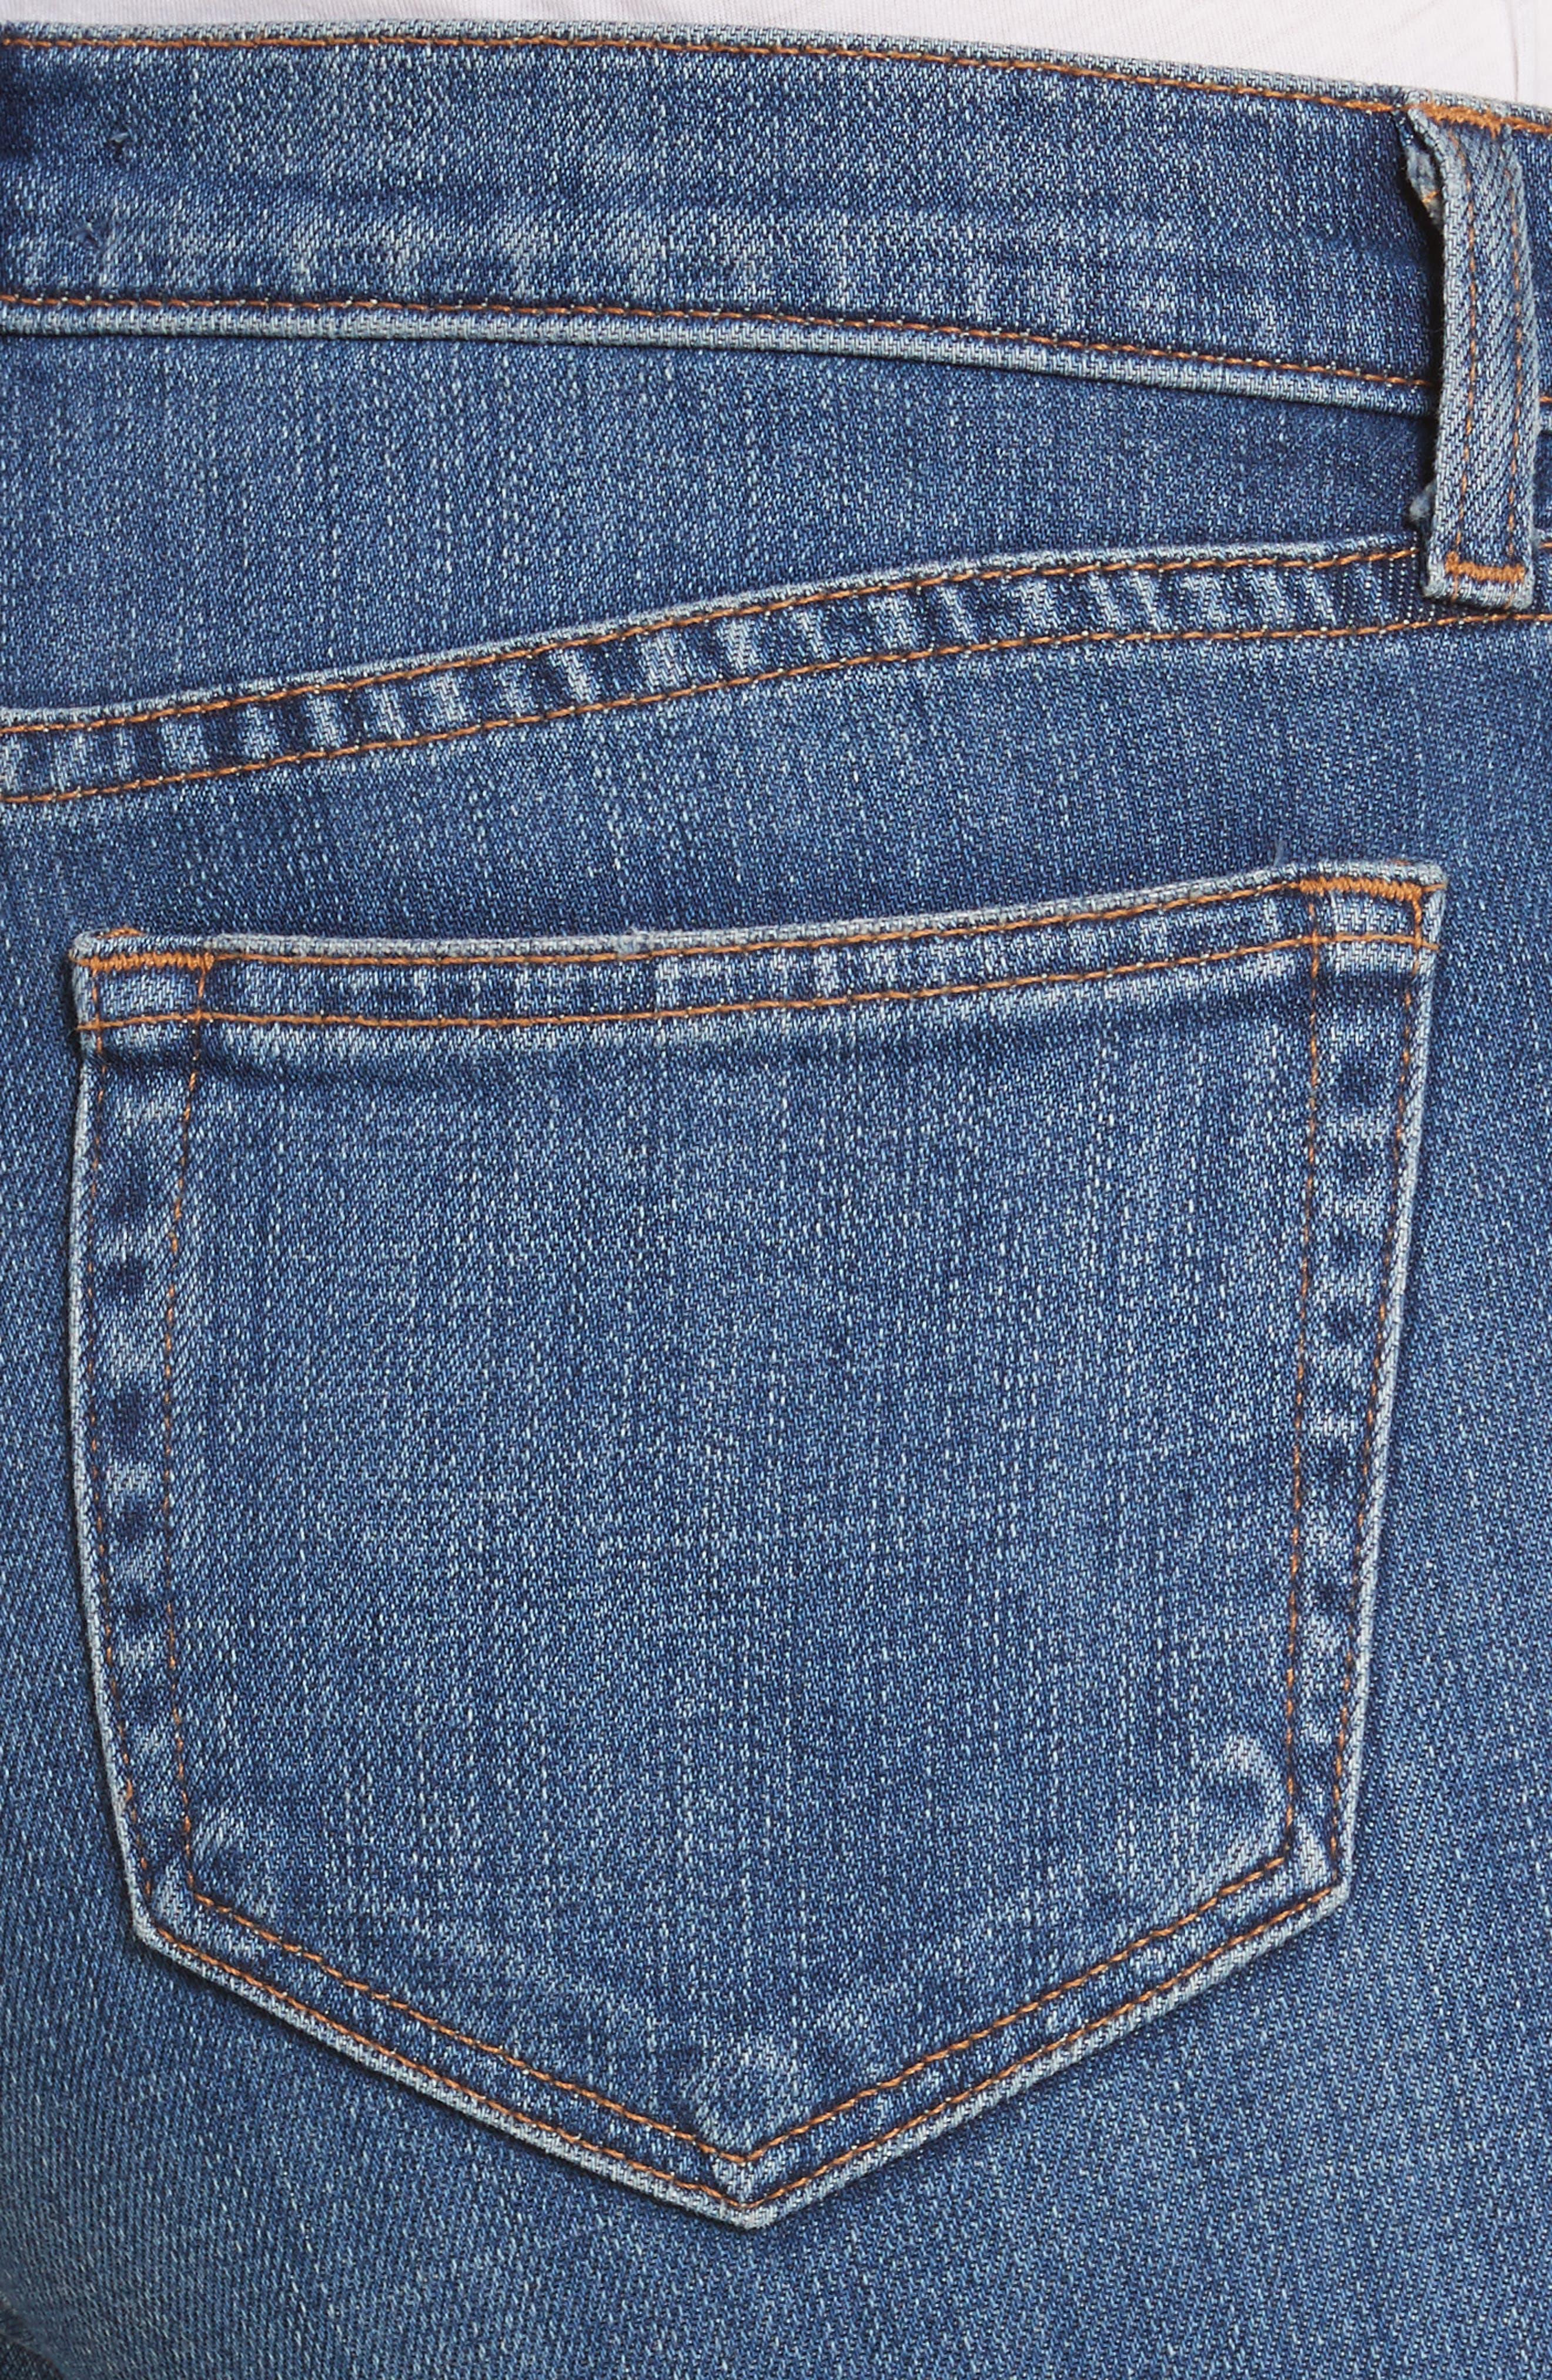 Laguna French High Waist Release Hem Jeans,                             Alternate thumbnail 4, color,                             Indigo